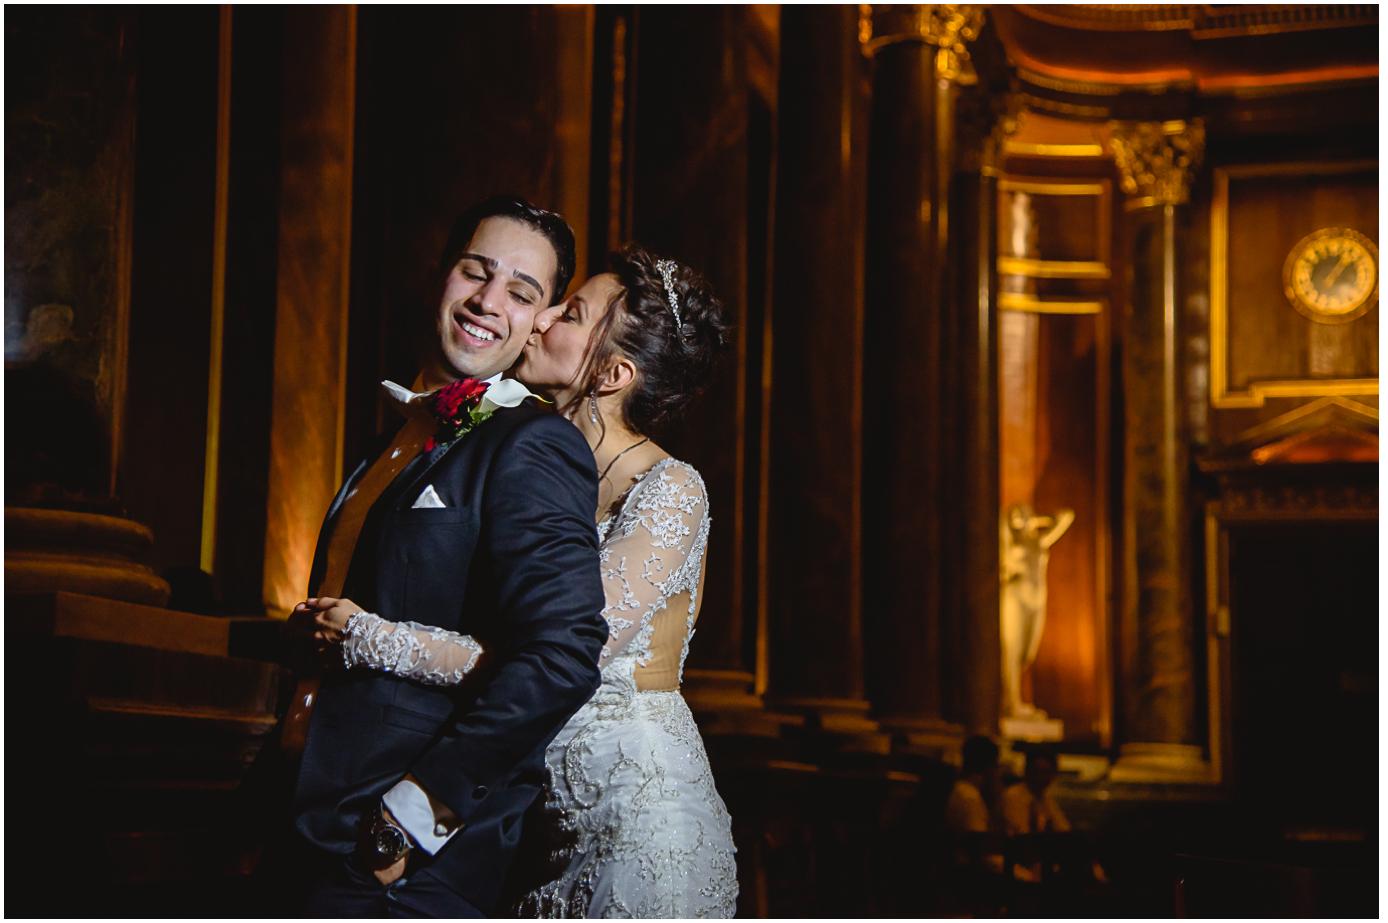 iranian wedding photographer 252 - Drapers Hall London Wedding Photographer